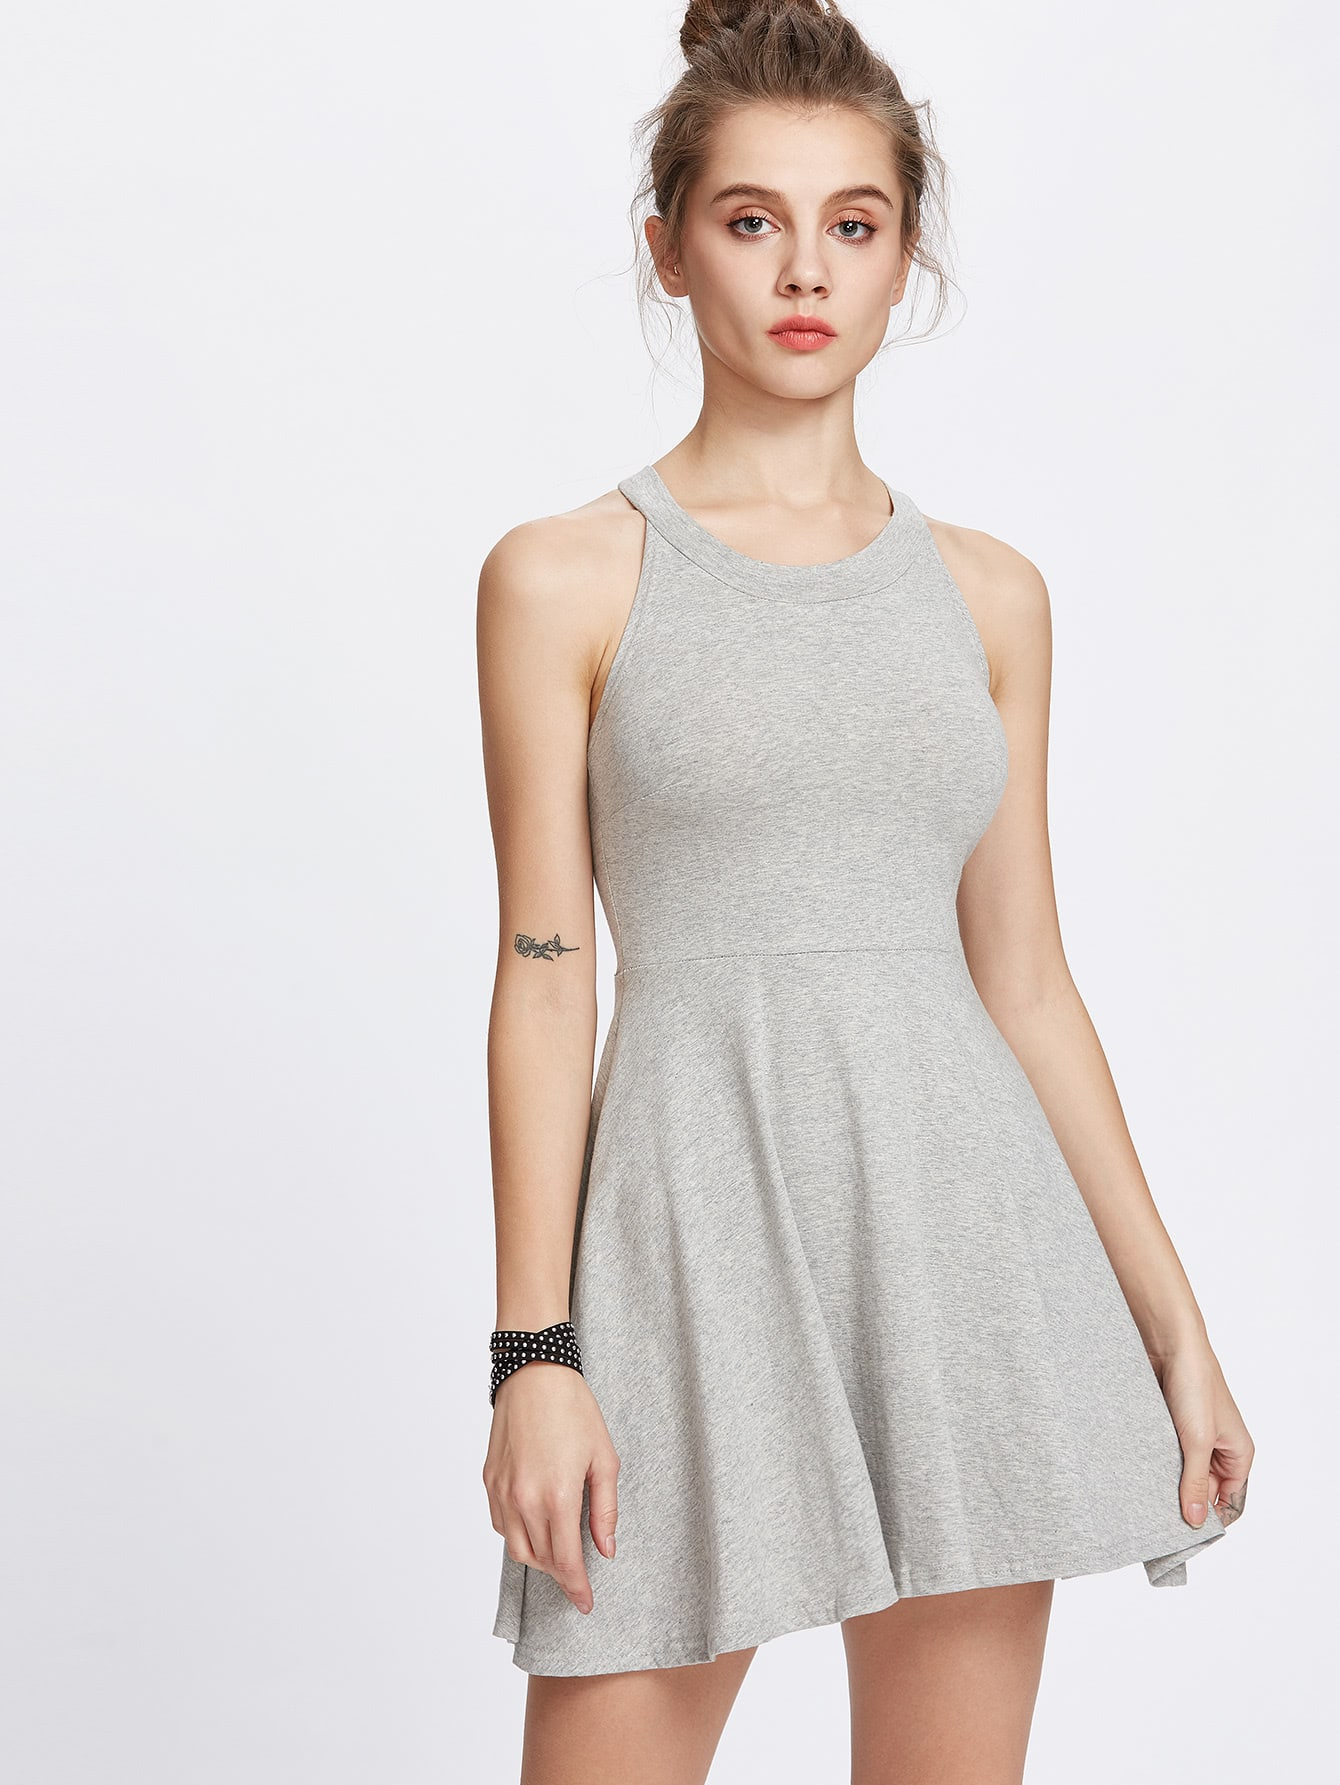 Grey Halter A-Line Flare Dress